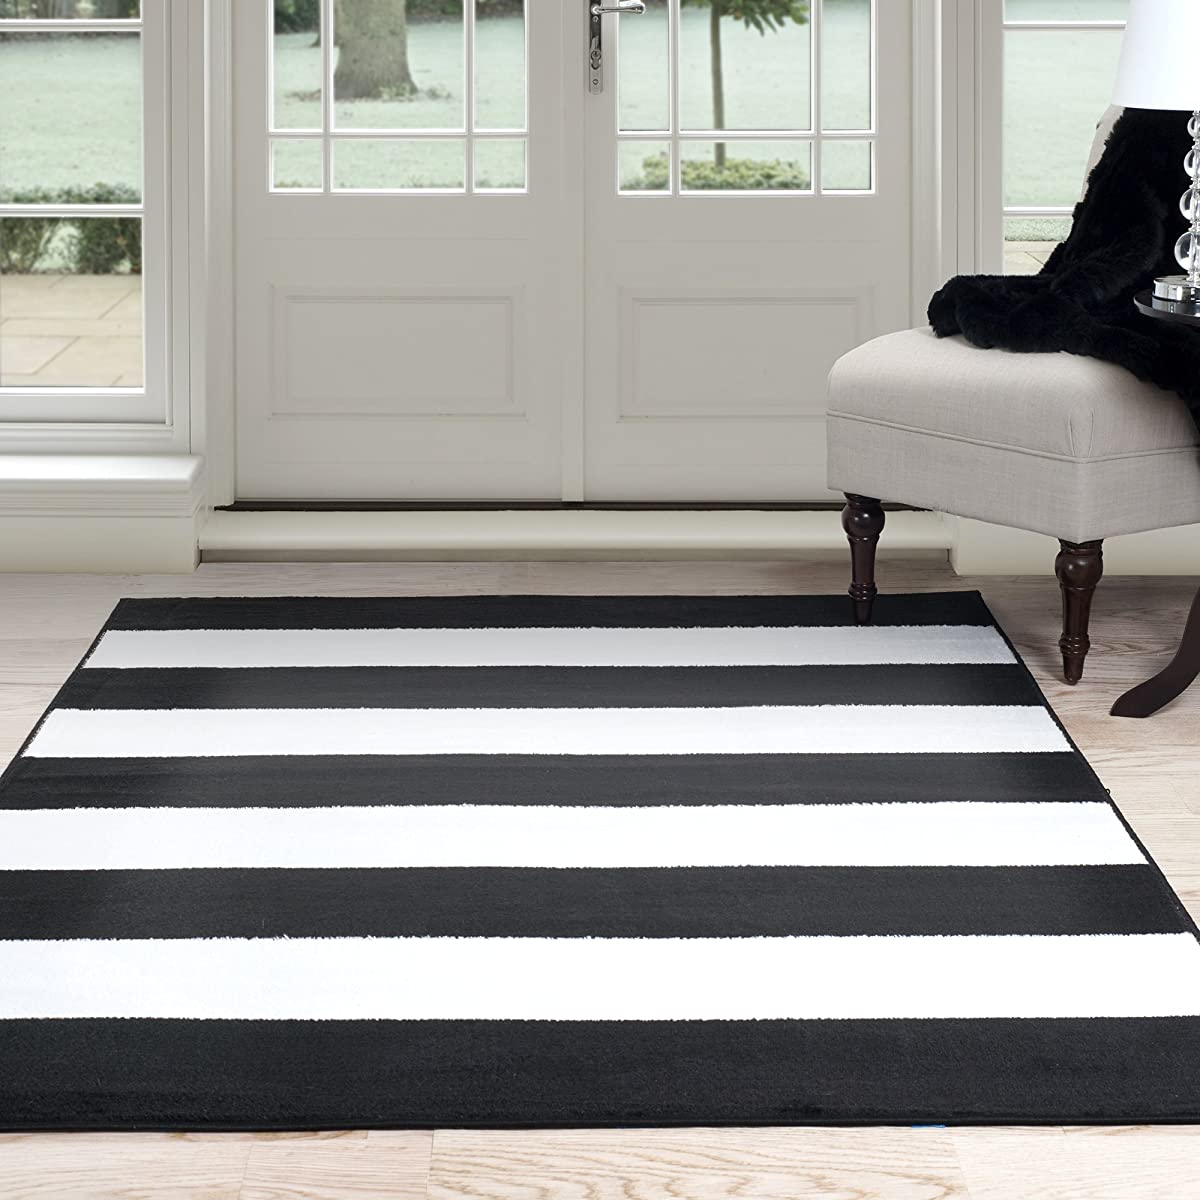 "Lavish Home Breton Stripe Area Rug, 5 by 77"", Black/White"